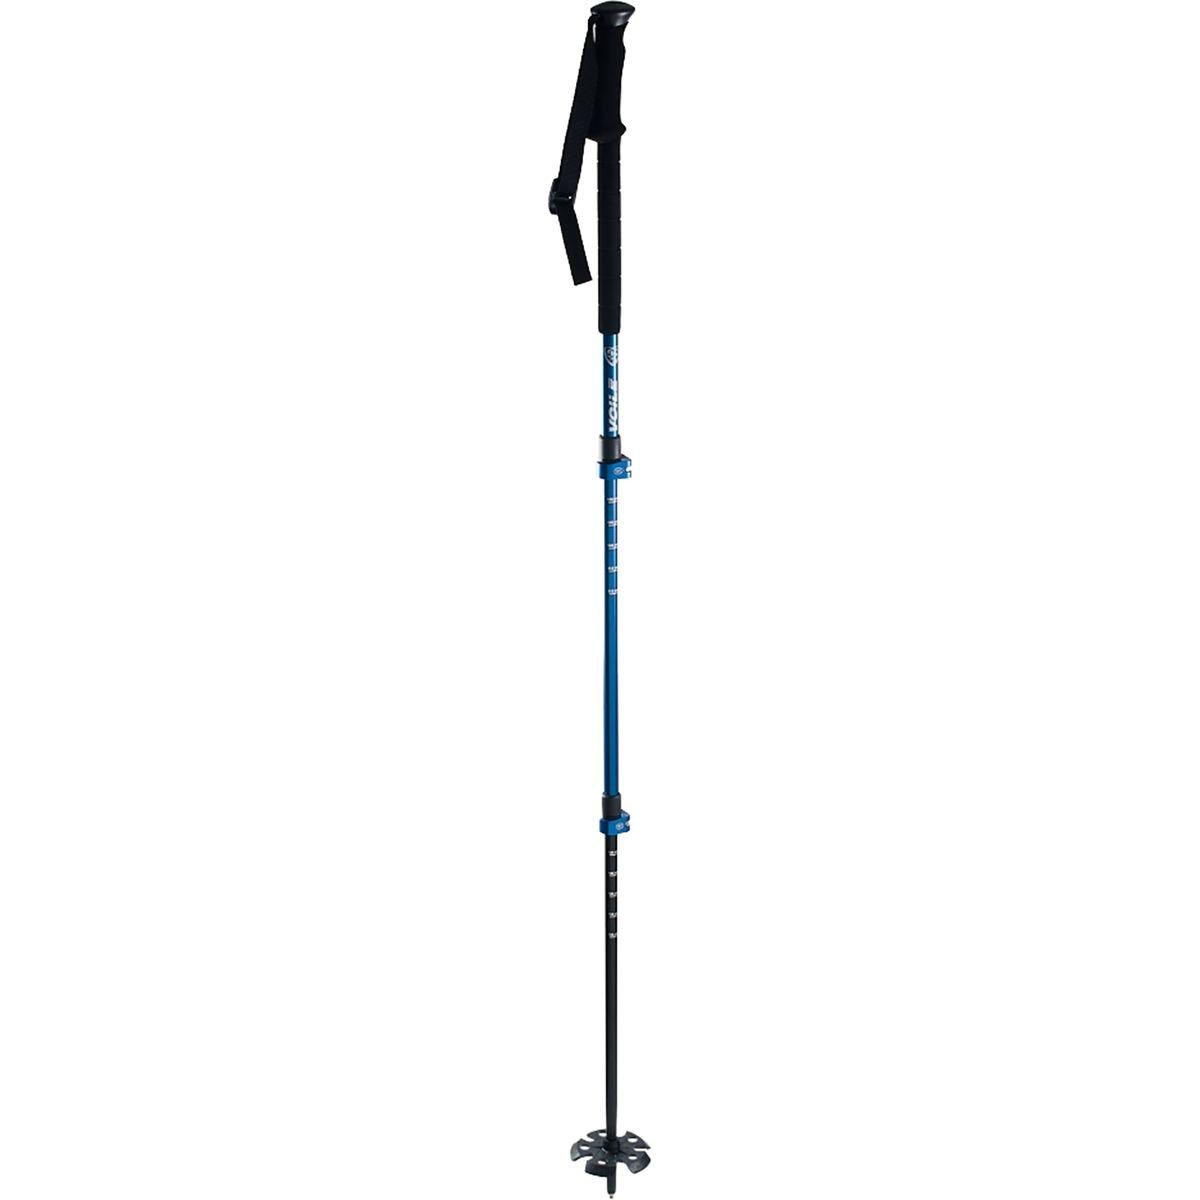 Voile CamLock 3-Part Poles 3-Part, 65cm to 135cm by Voile